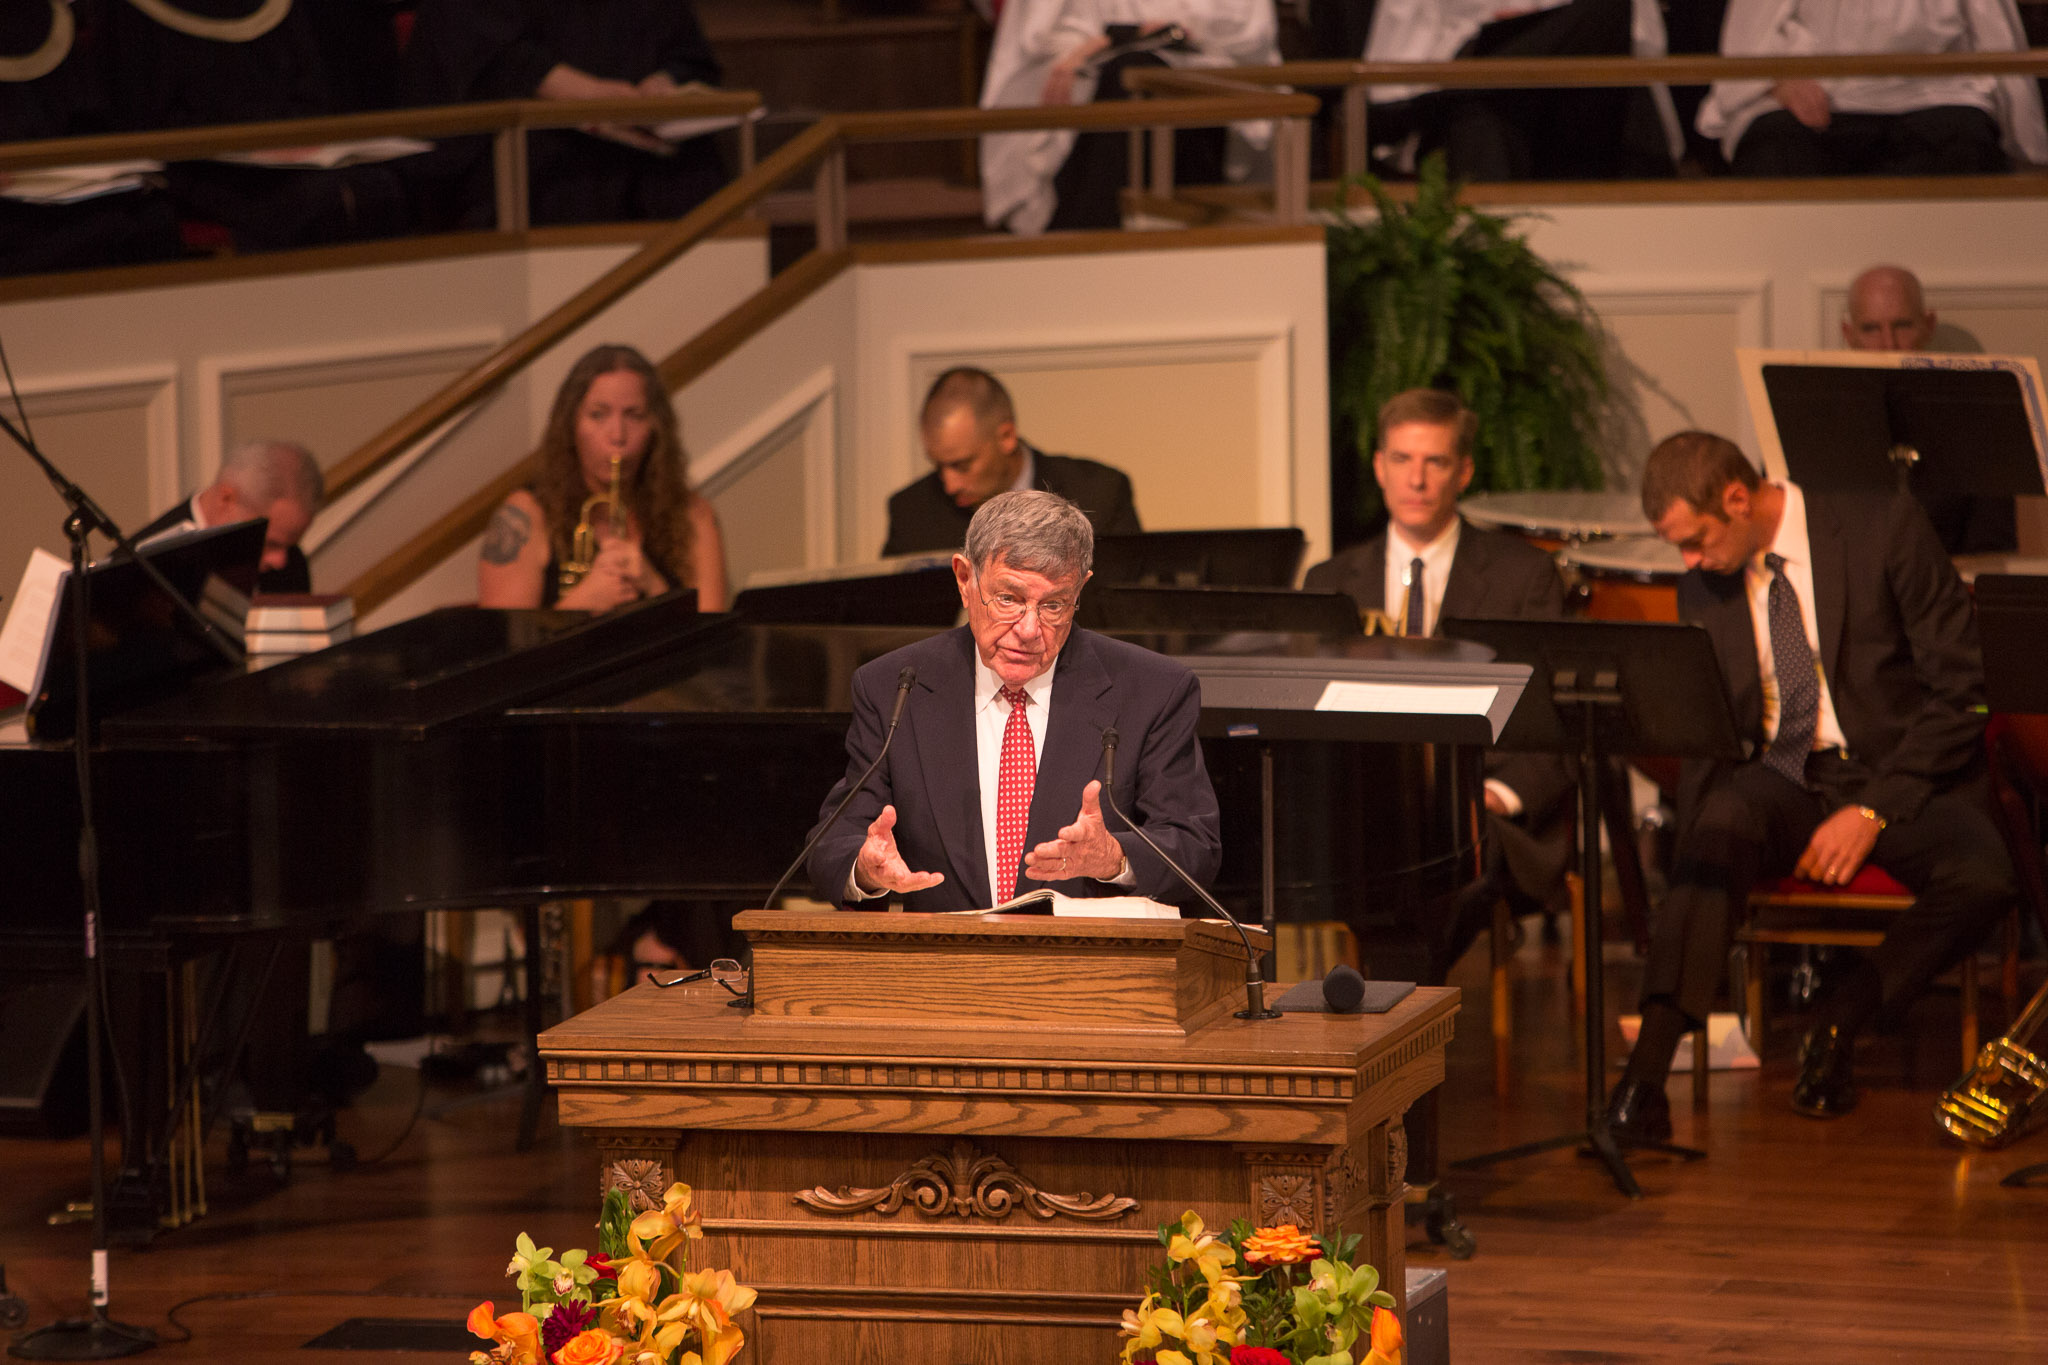 Dr. Earl Palmer gives a sermon on faithfulness and joy. Photo by Scott Ball.